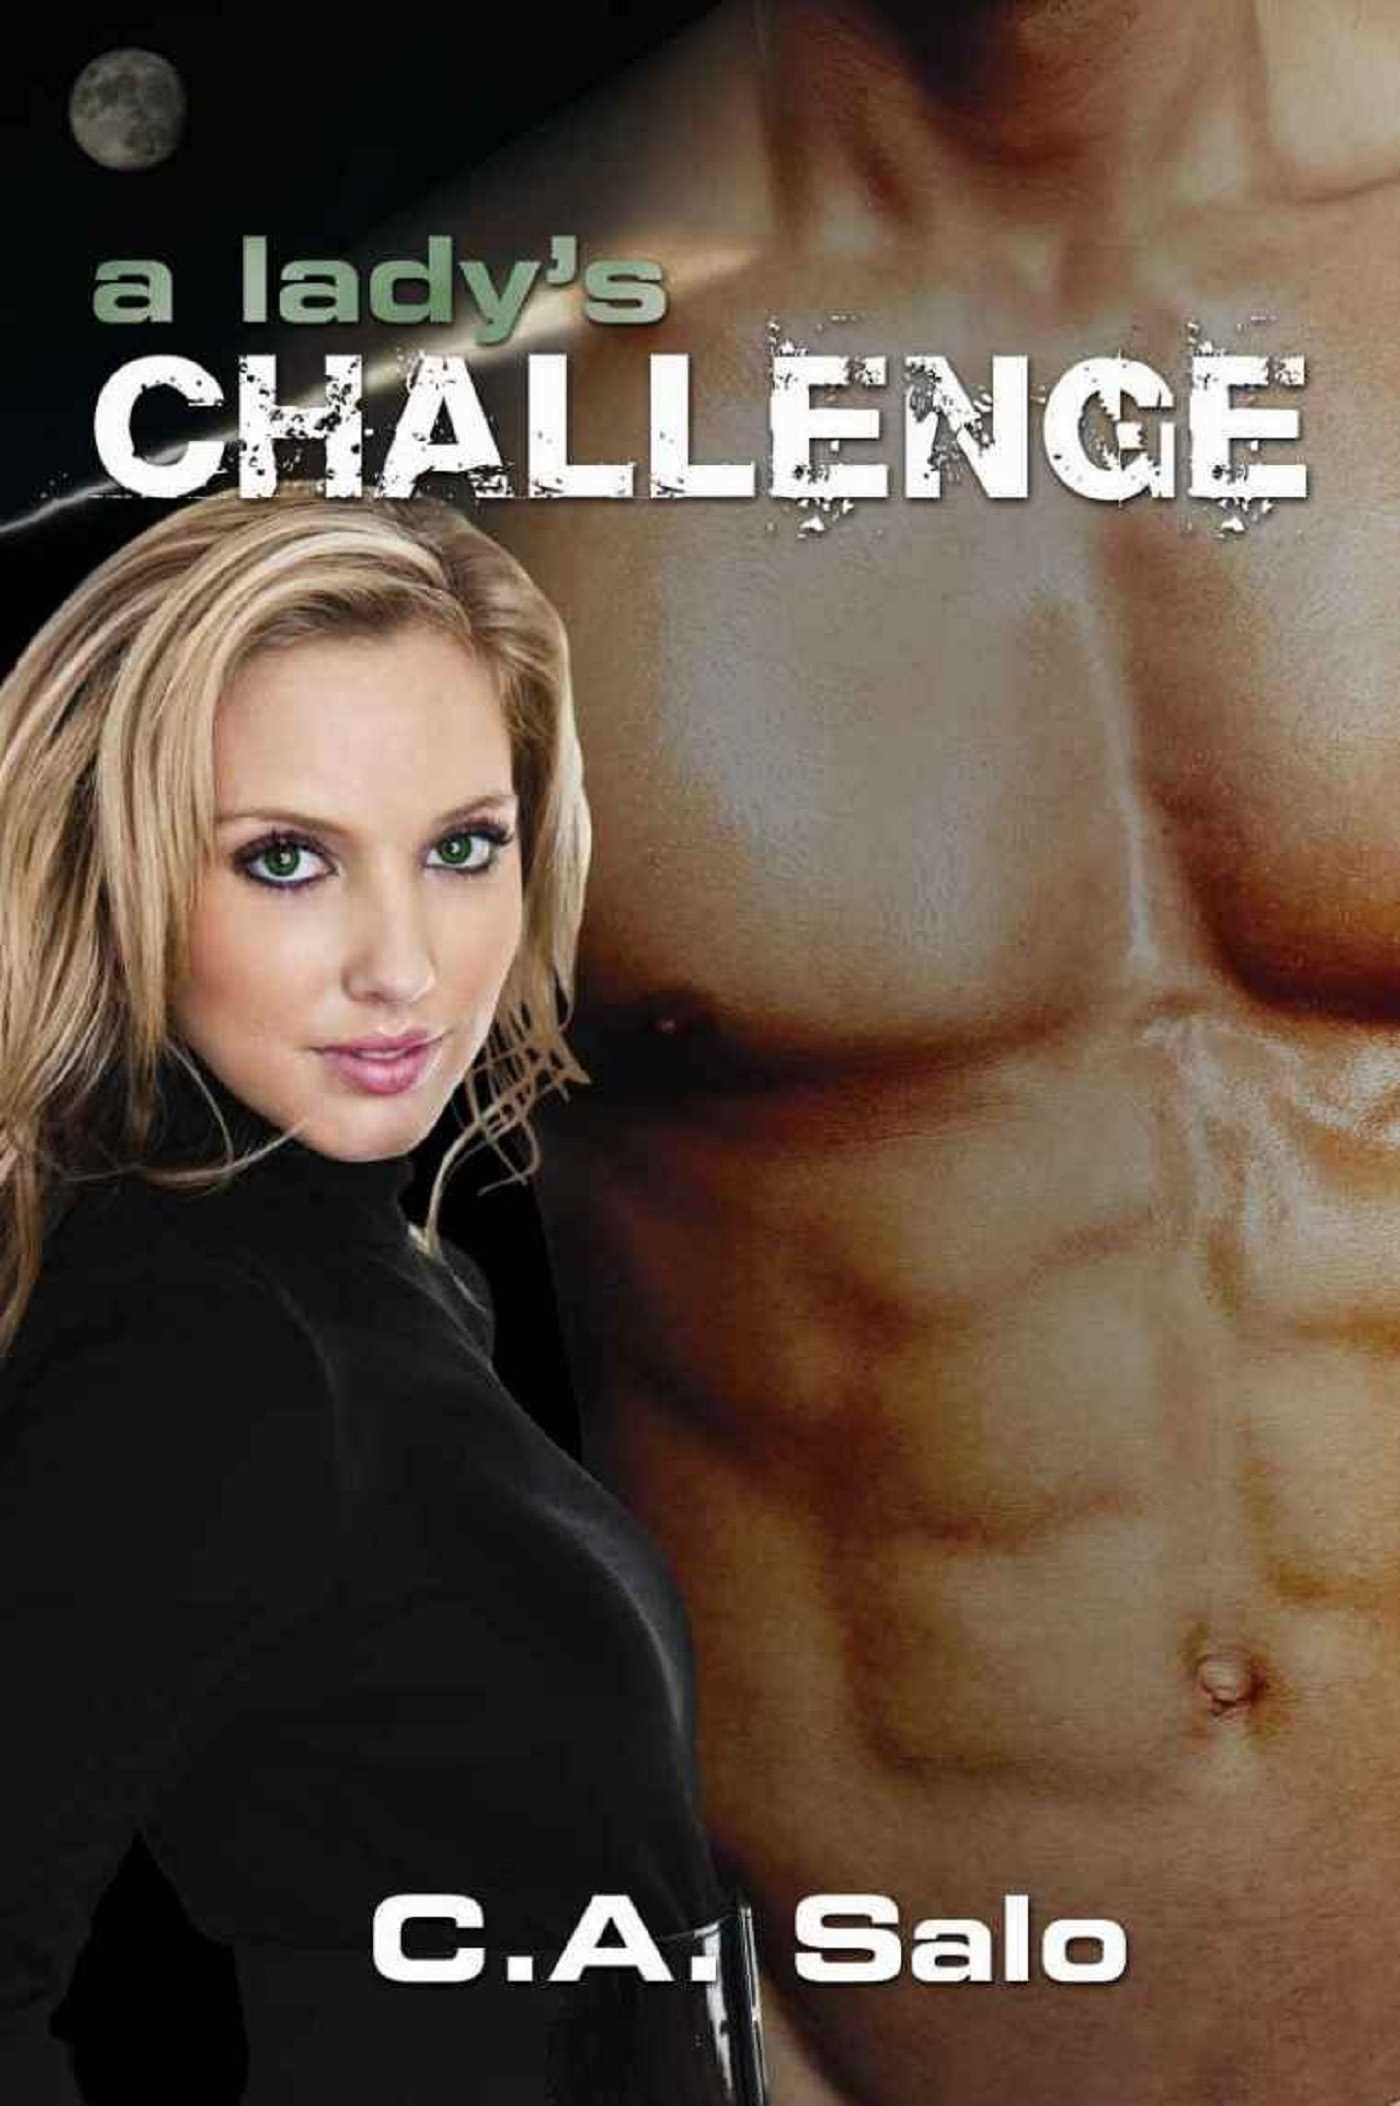 A ladys challenge 9781603138246 hr